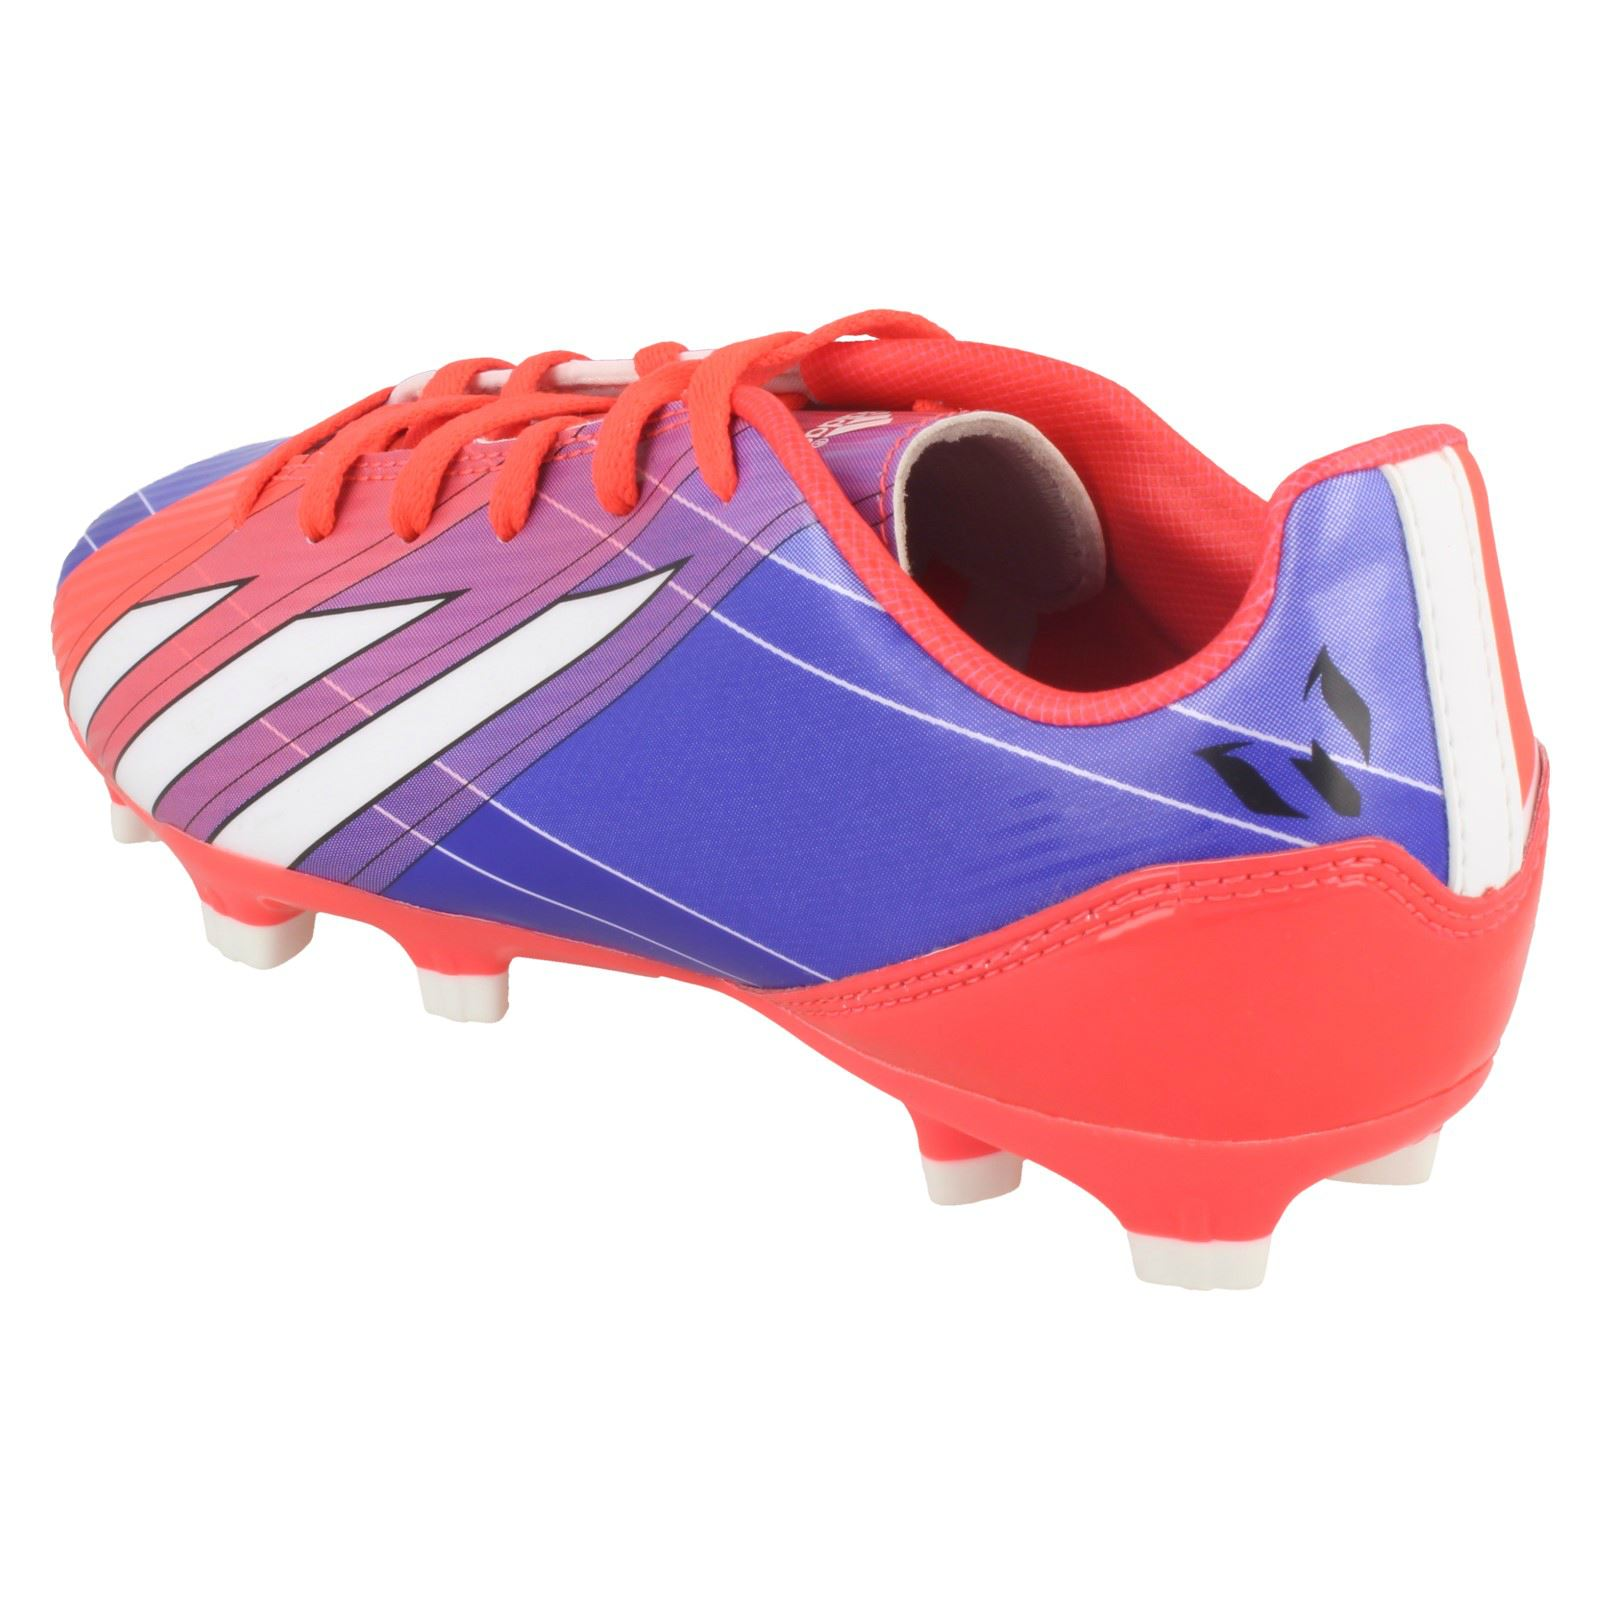 ab3c286aca85c Adidas Para Niños Lionel Messi Botas de fútbol   F10 TRX FG J